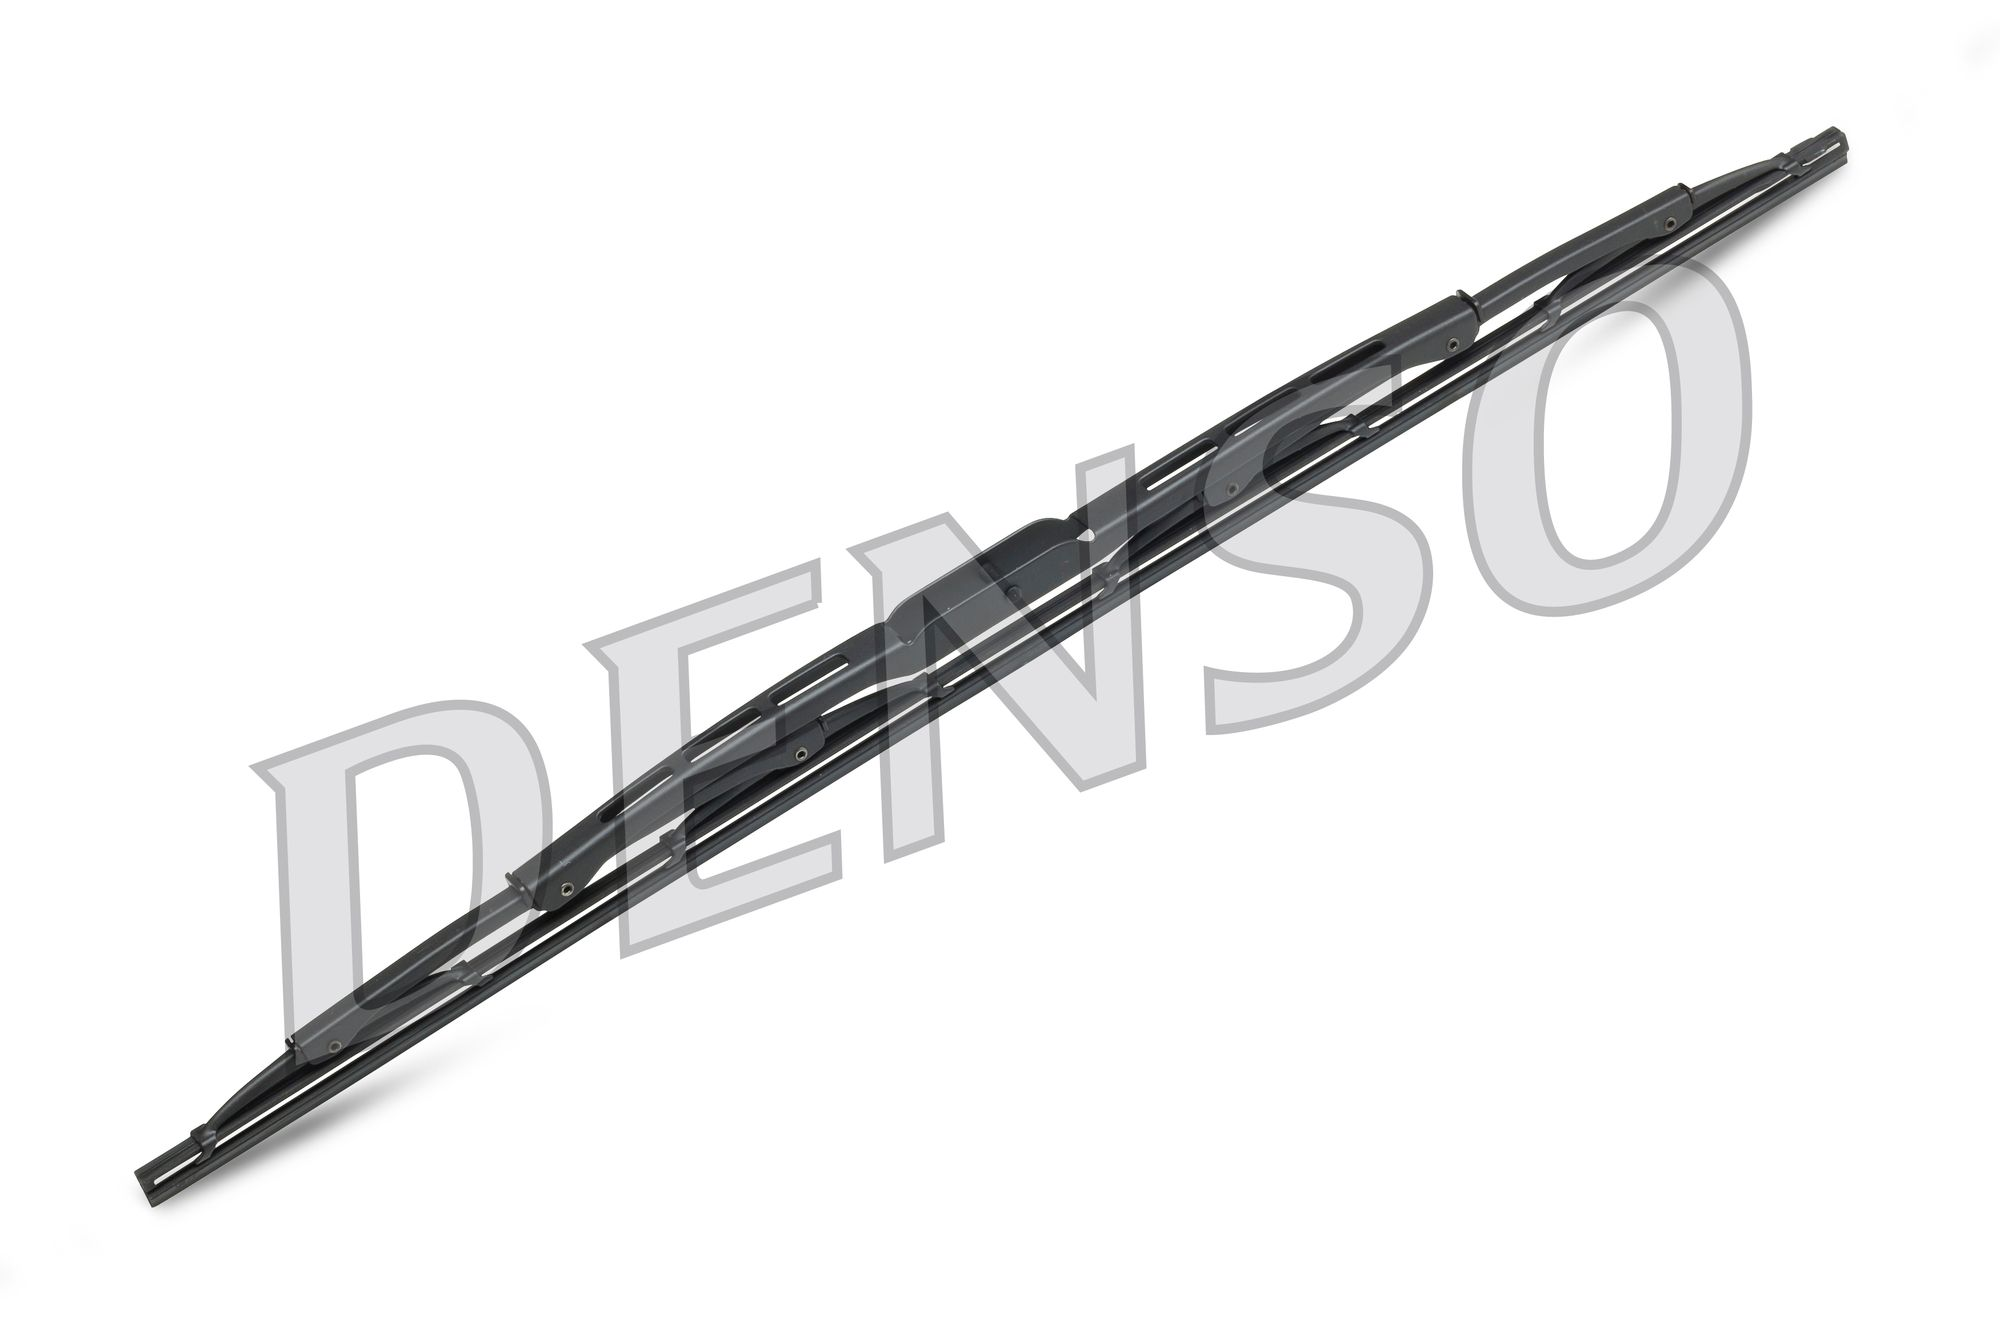 DENSO Standard DM-050 Törlőlapát